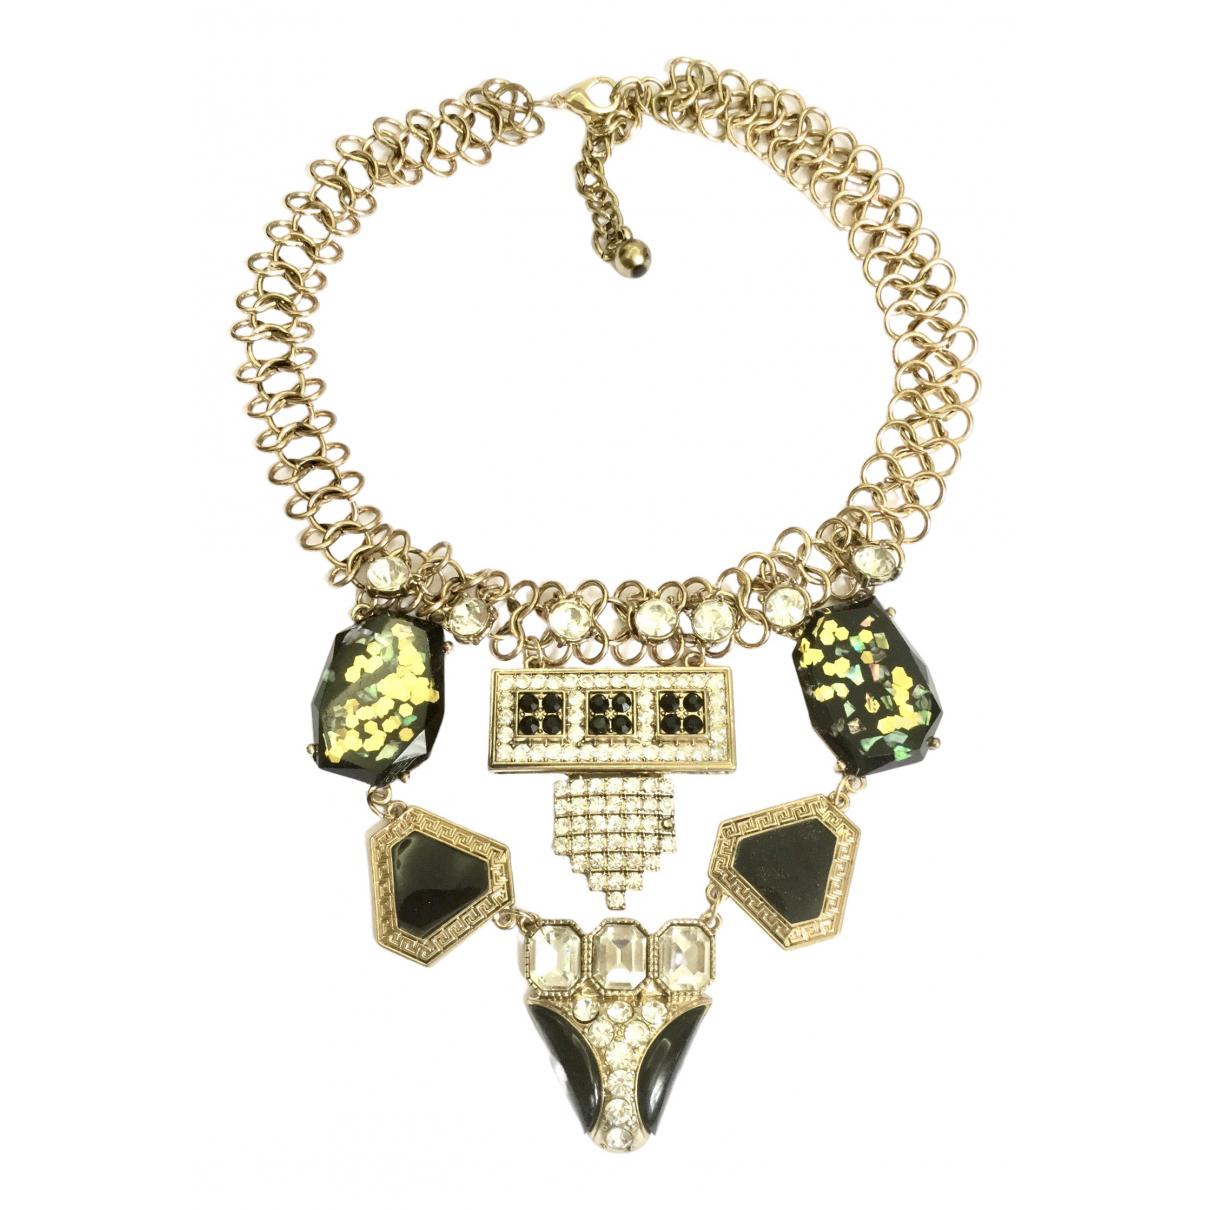 Yves Saint Laurent N Gold Metal necklace for Women N